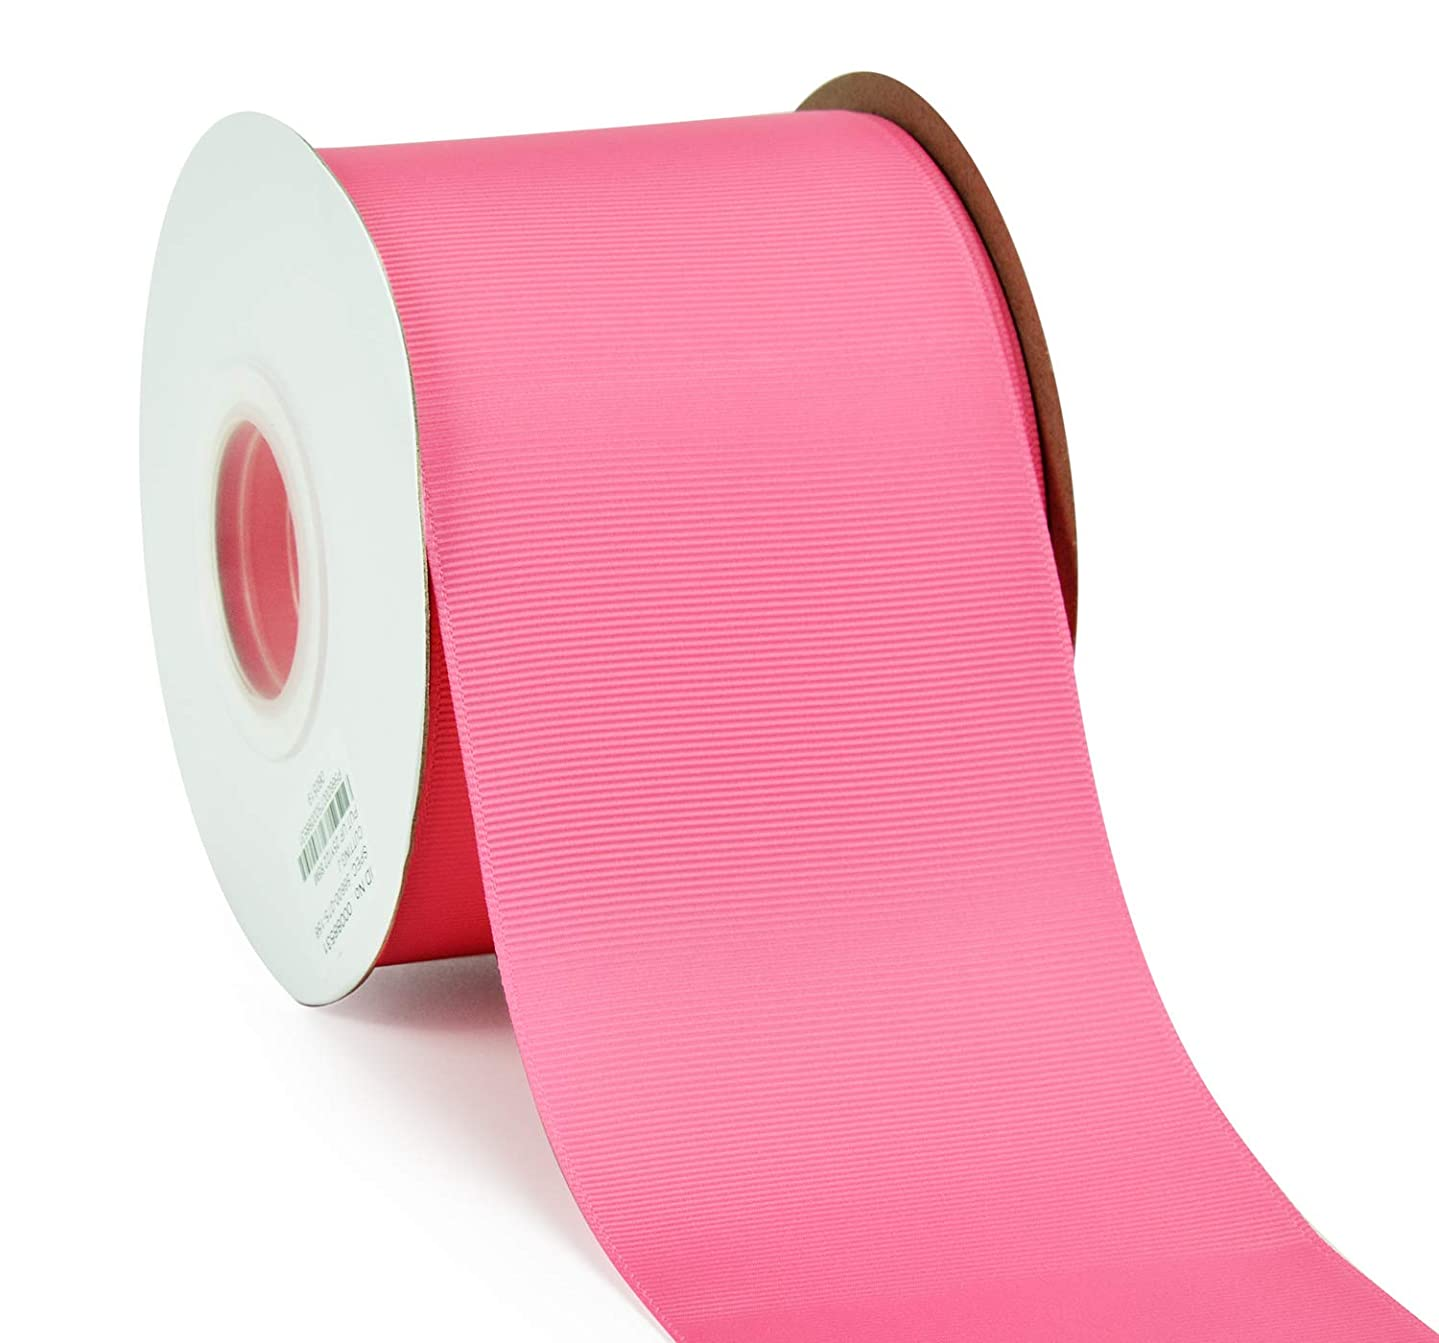 YAMA 3 inch Solid Grosgrain Ribbon Roll - 25 Yards (3 Inch 25yds, Hot Pink)